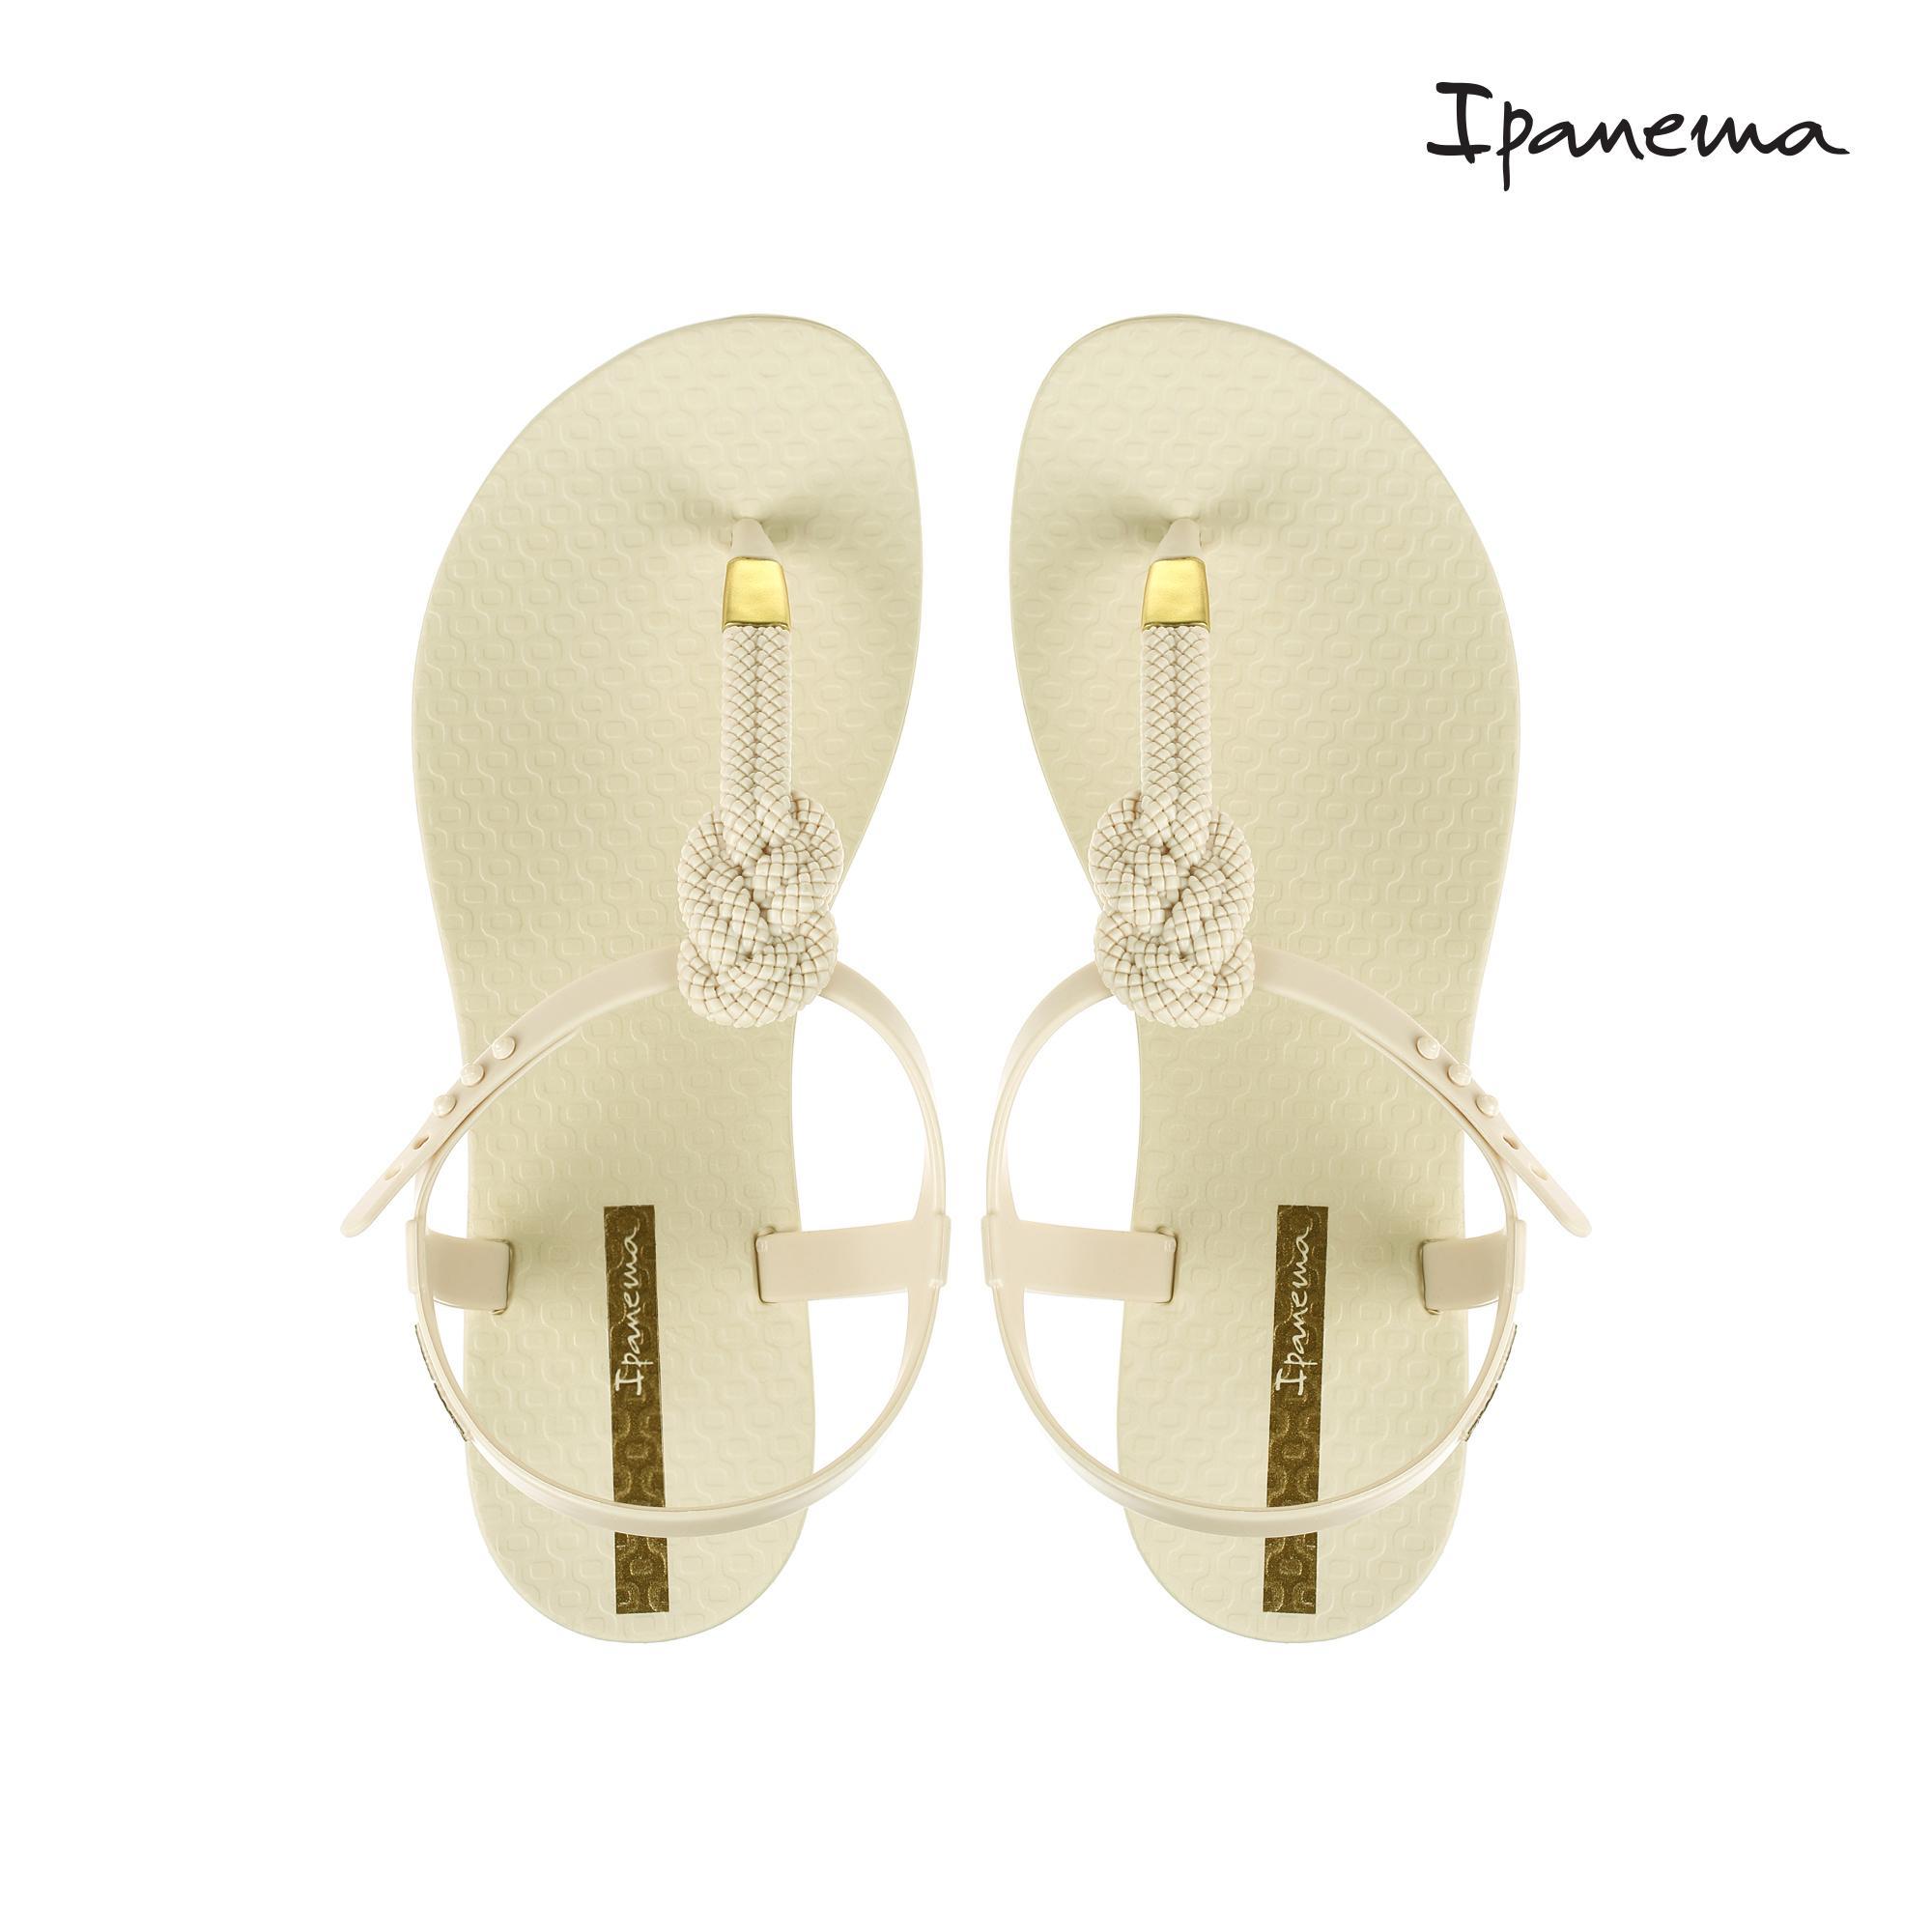 cebb0ae63 Ipanema Philippines  Ipanema price list - Ipanema Flip Flop ...